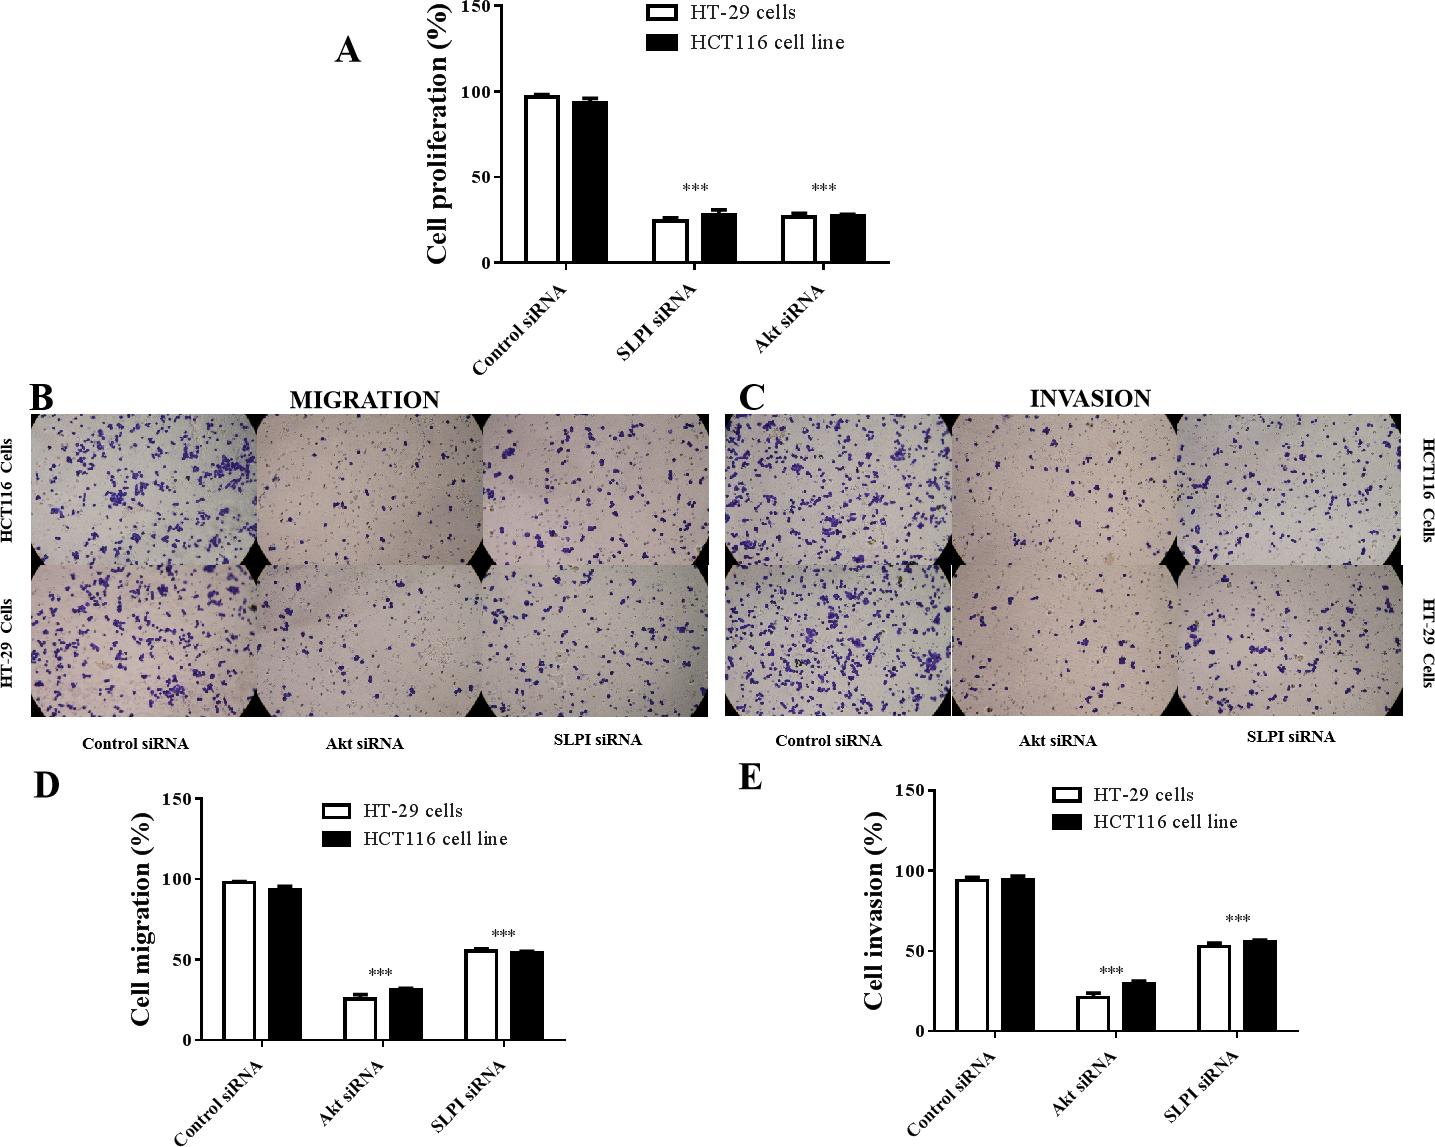 Targeting Secretory Leukocyte Protease Inhibitor Slpi Inhibits Colorectal Cancer Cell Growth Migration And Invasion Via Downregulation Of Akt Peerj